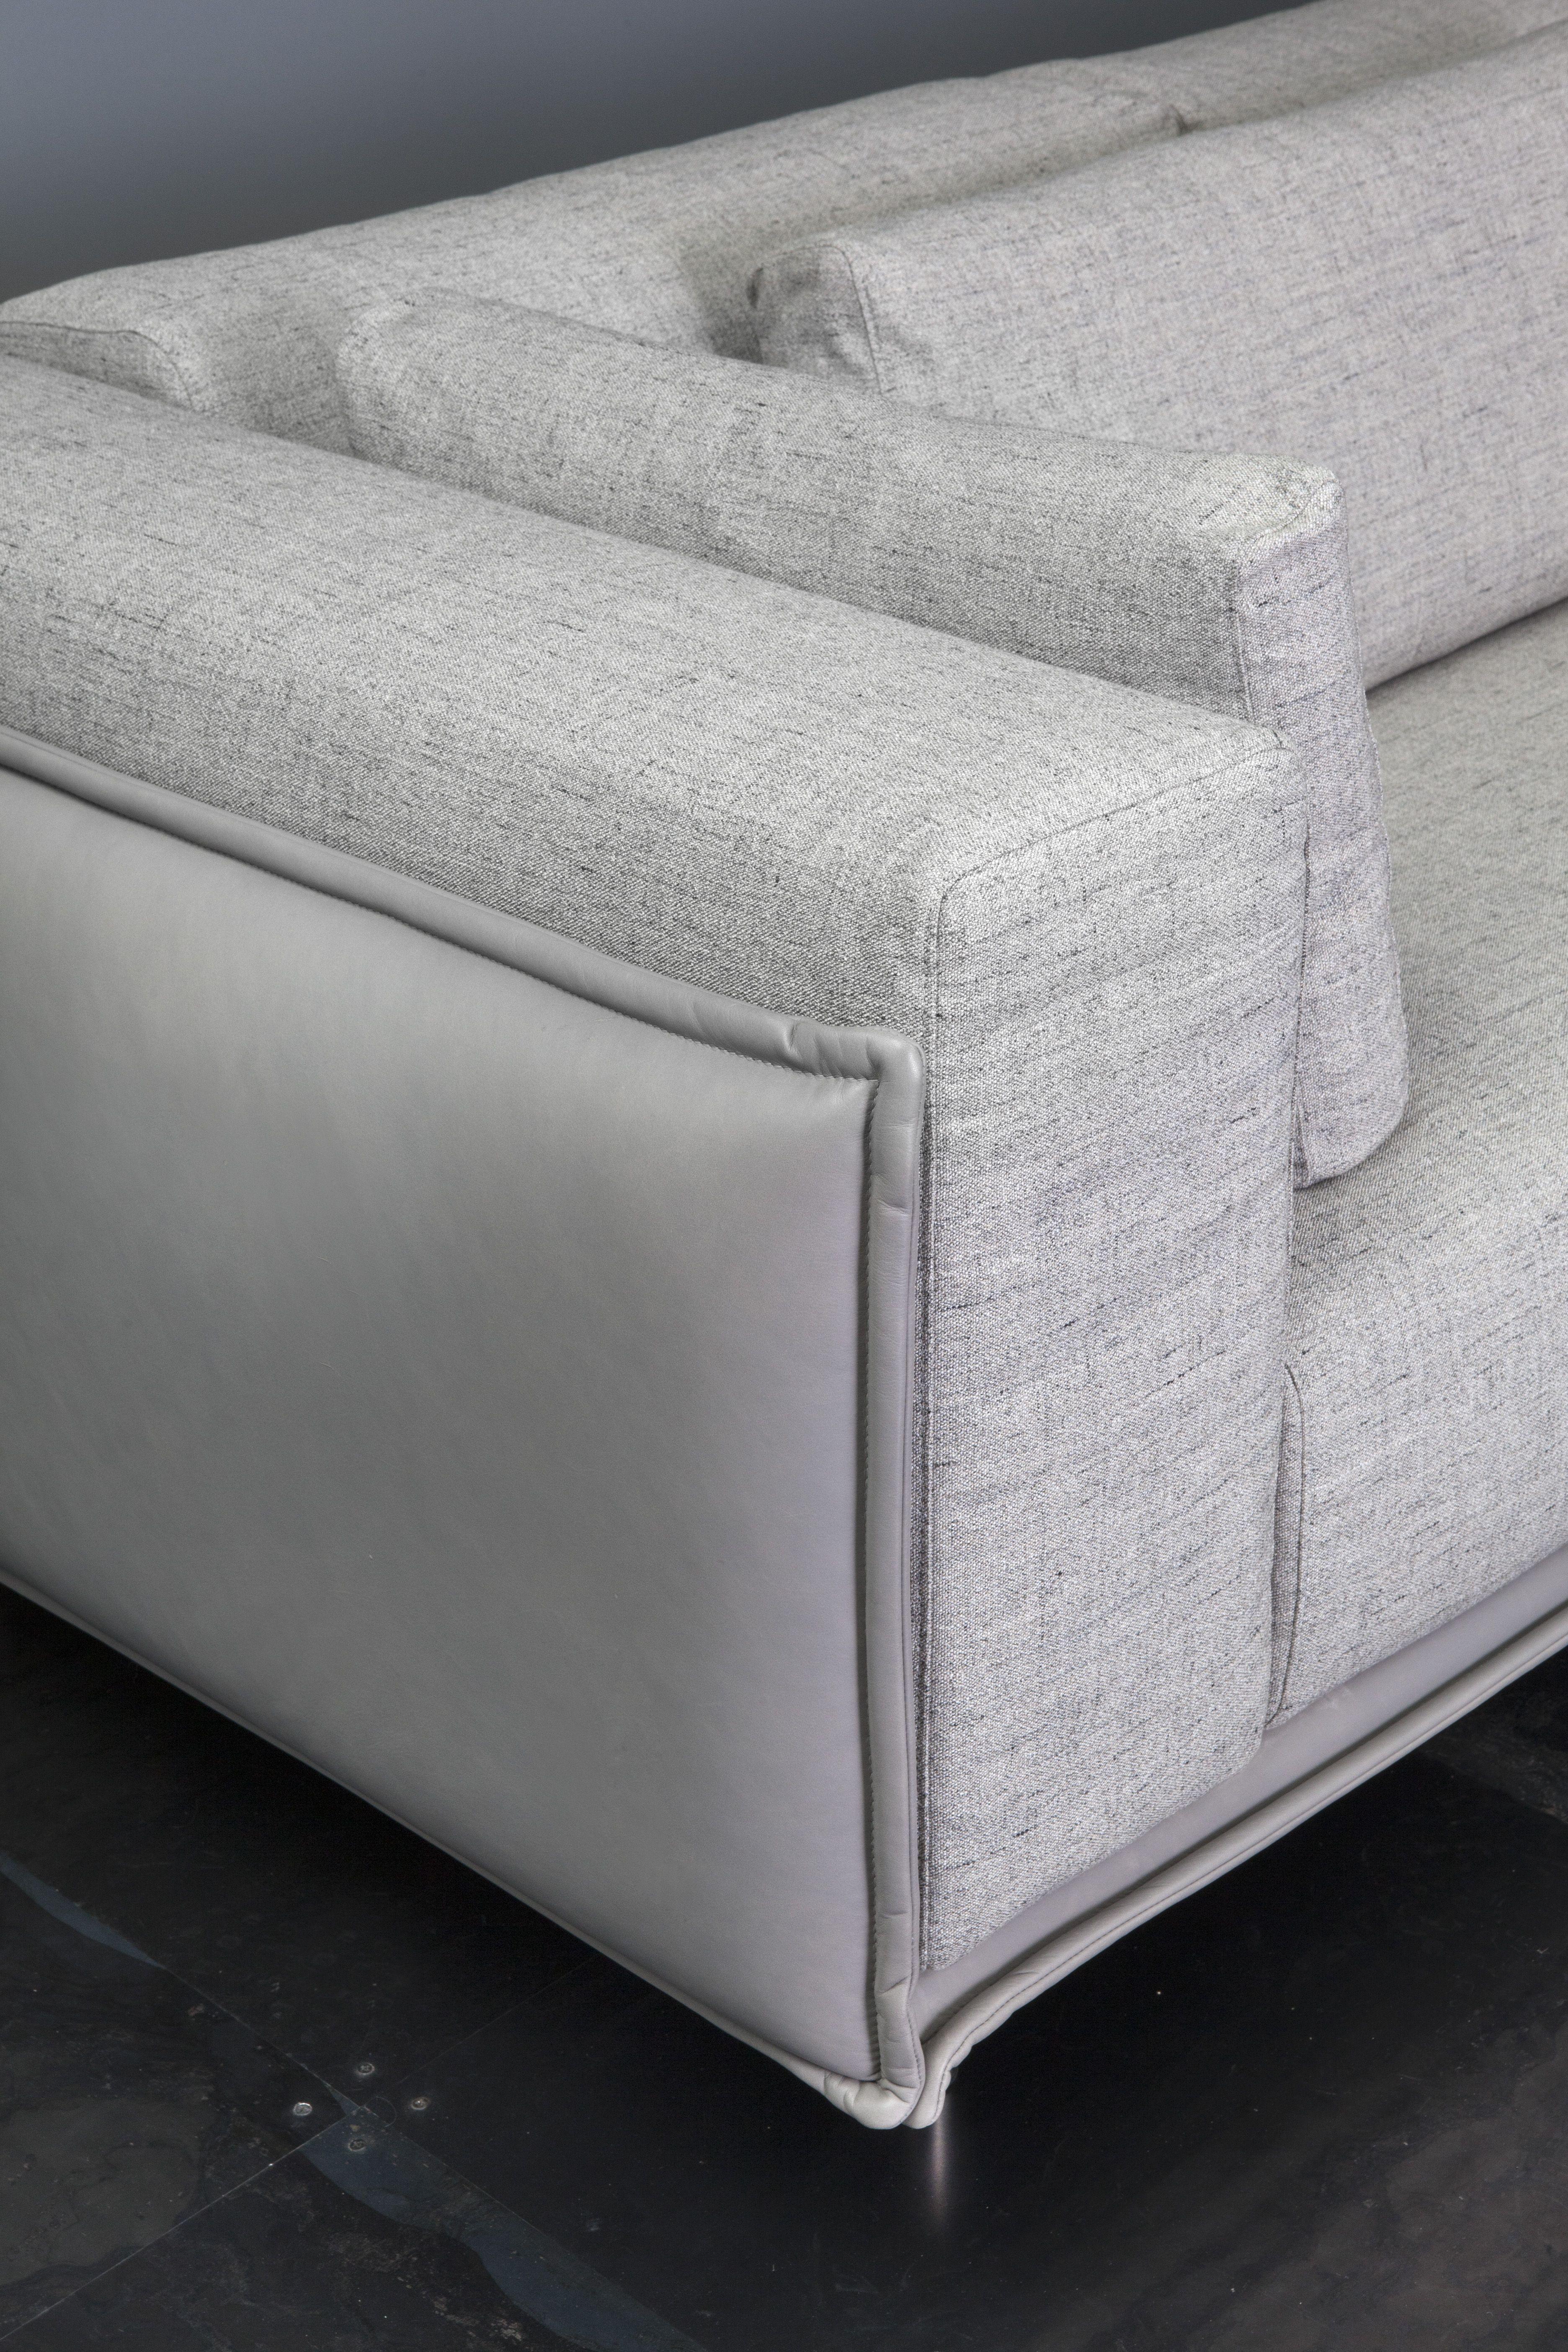 meijers furniture. Sofa Wellington; Remy Meijers Collection Furniture